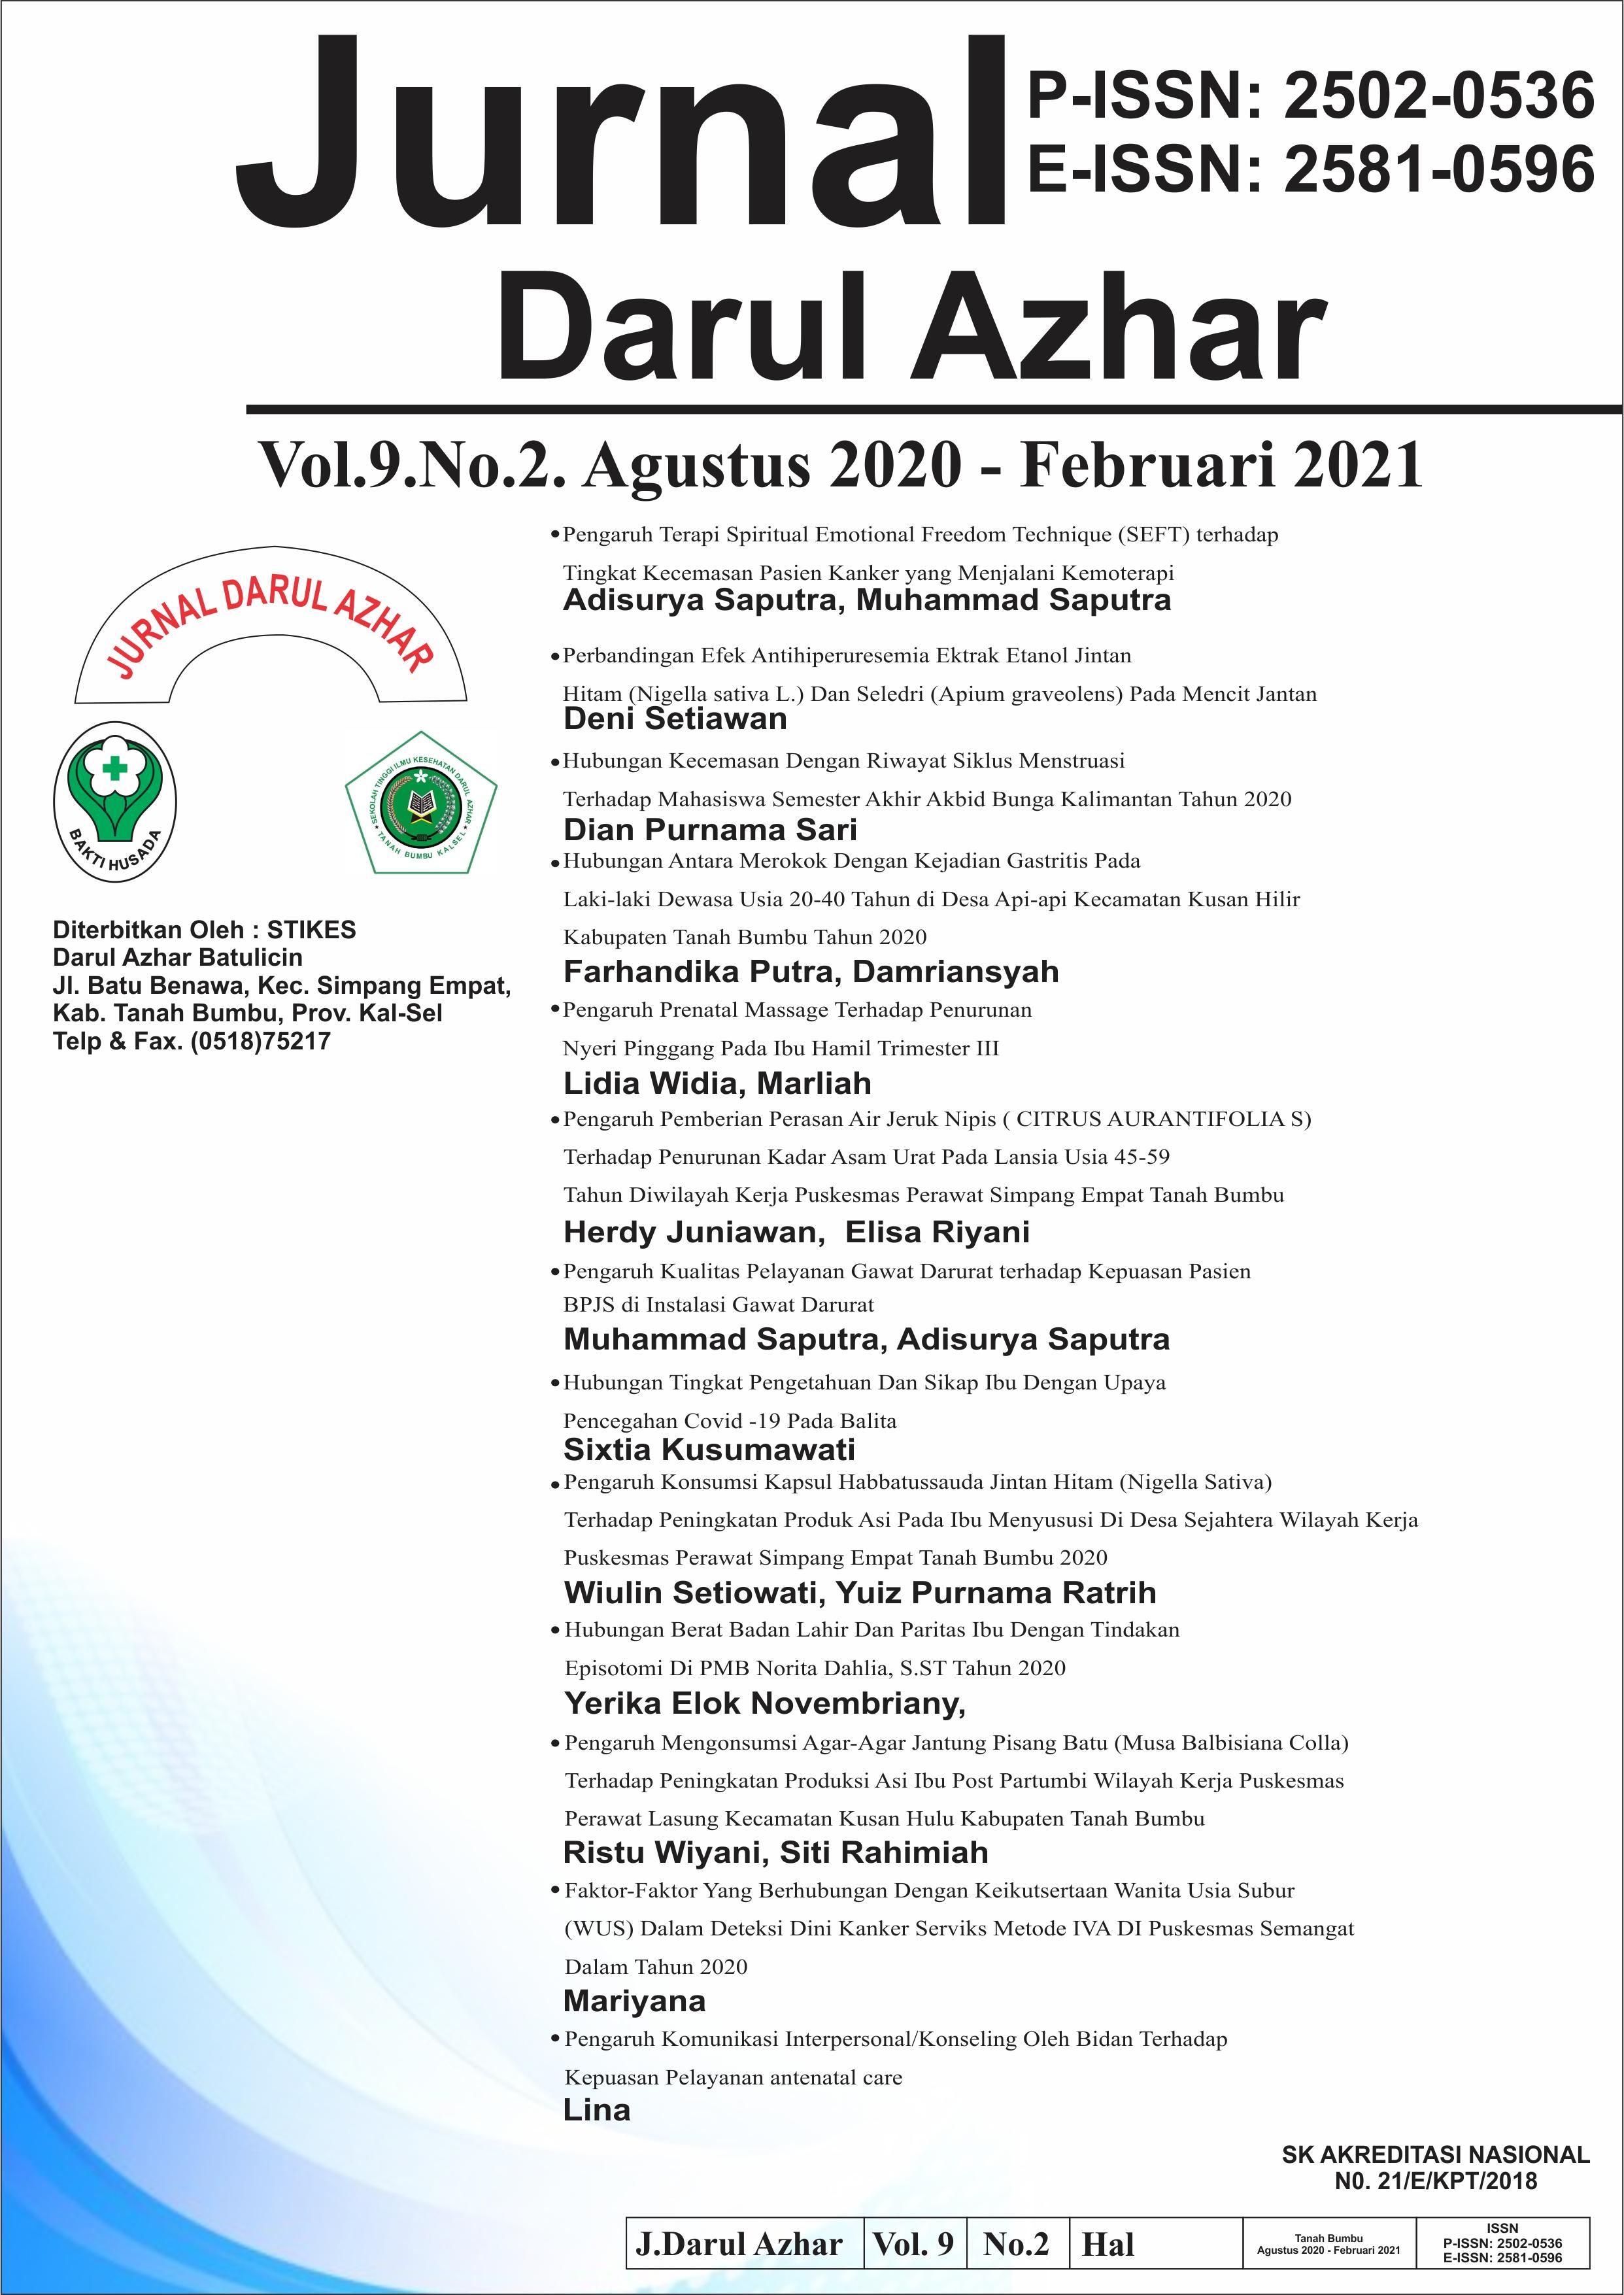 Penerbitan Jurnal Vol 9. No.02 merupakan edisi penomeran terbaru setelah Vol.09 No.1